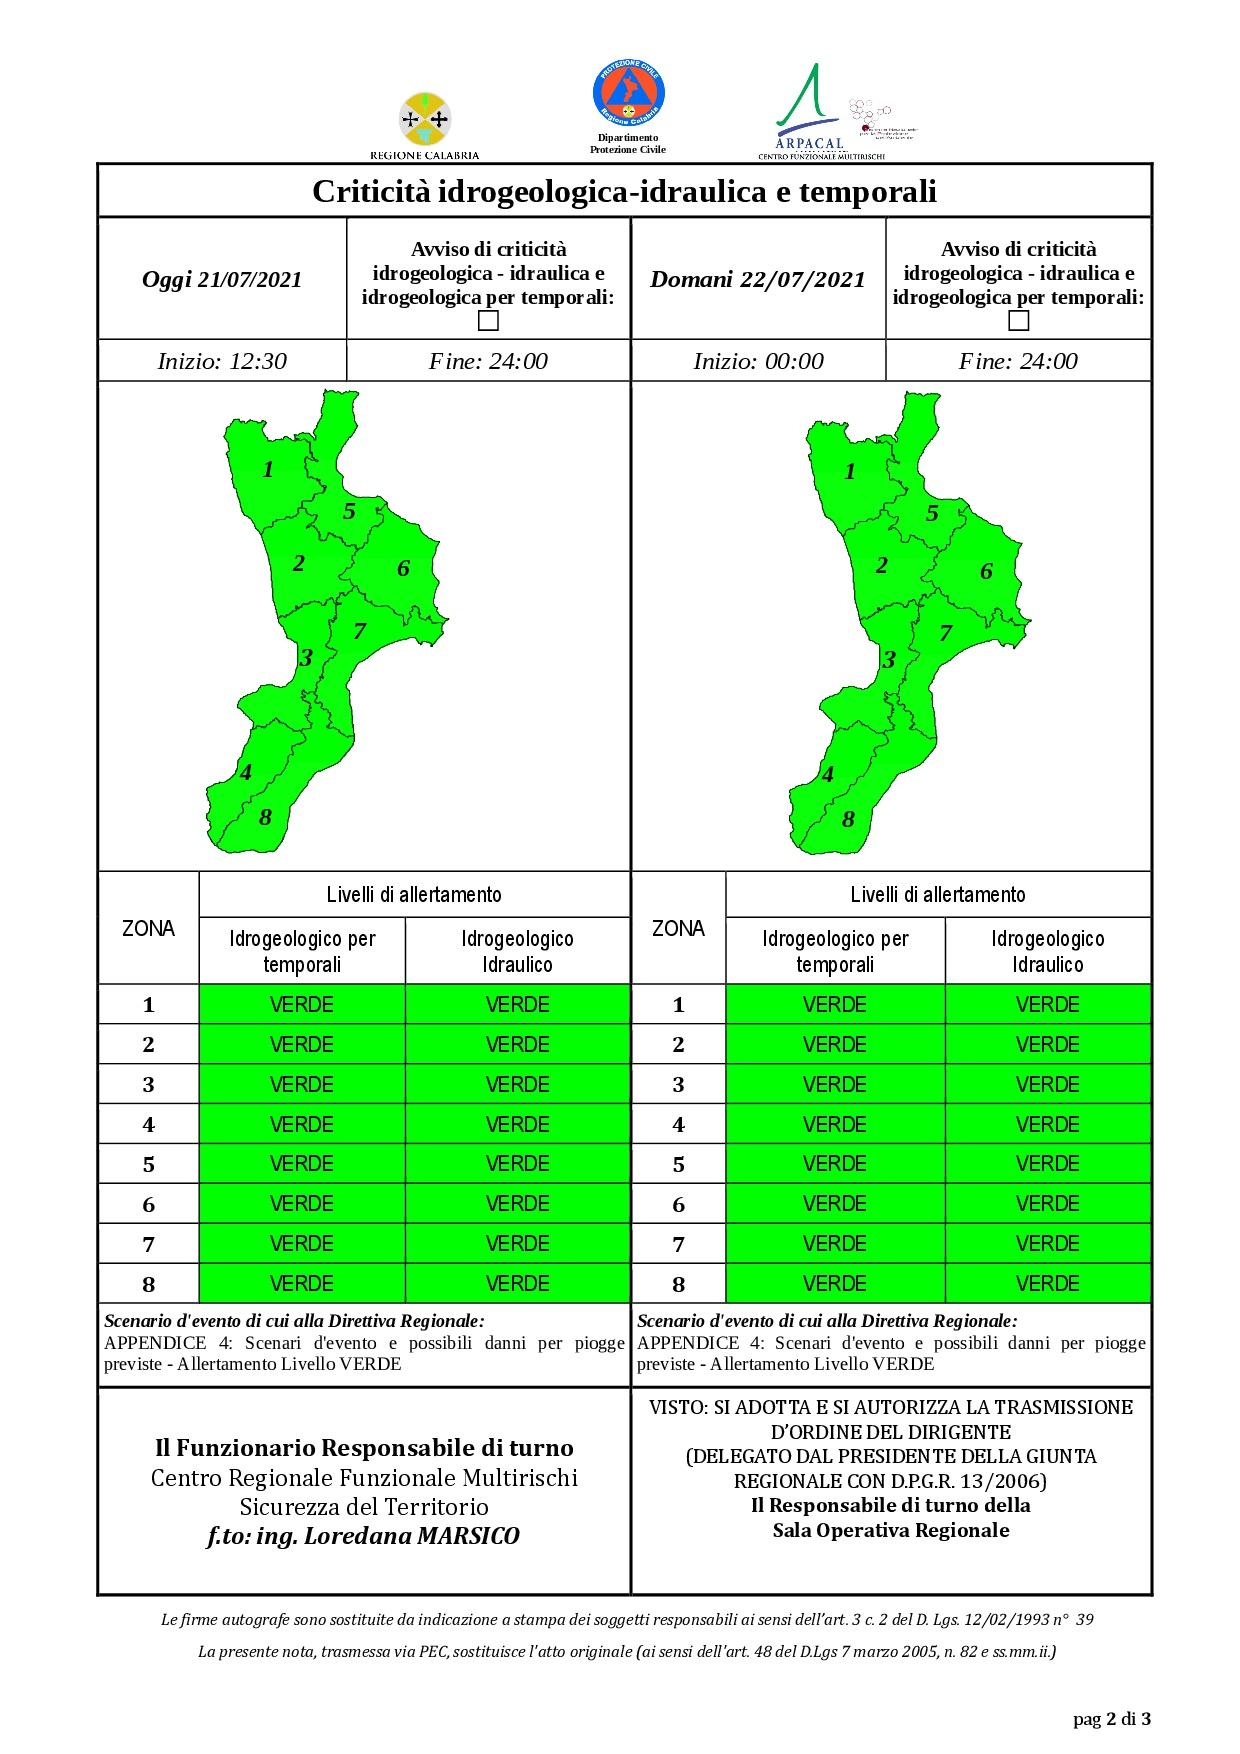 Criticità idrogeologica-idraulica e temporali in Calabria 21-07-2021